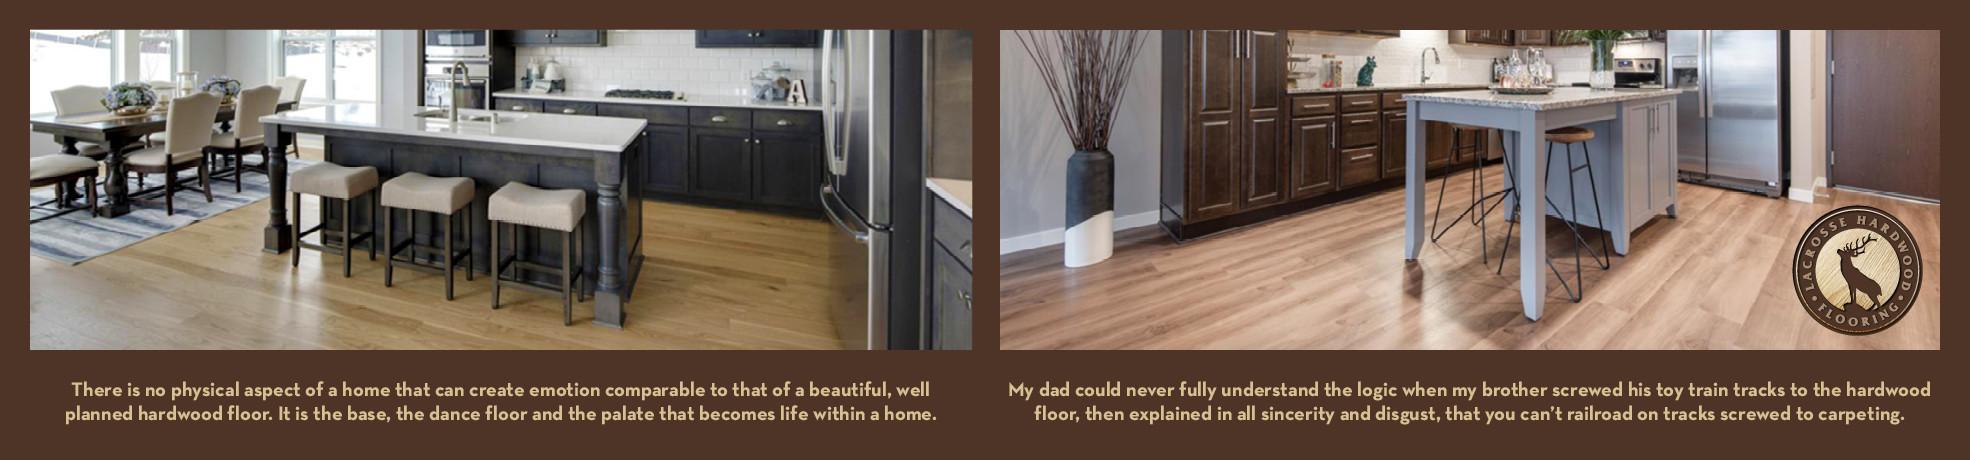 hardwood floor color options of lacrosse hardwood flooring walnut white oak red oak hickory throughout lhfsliderv24